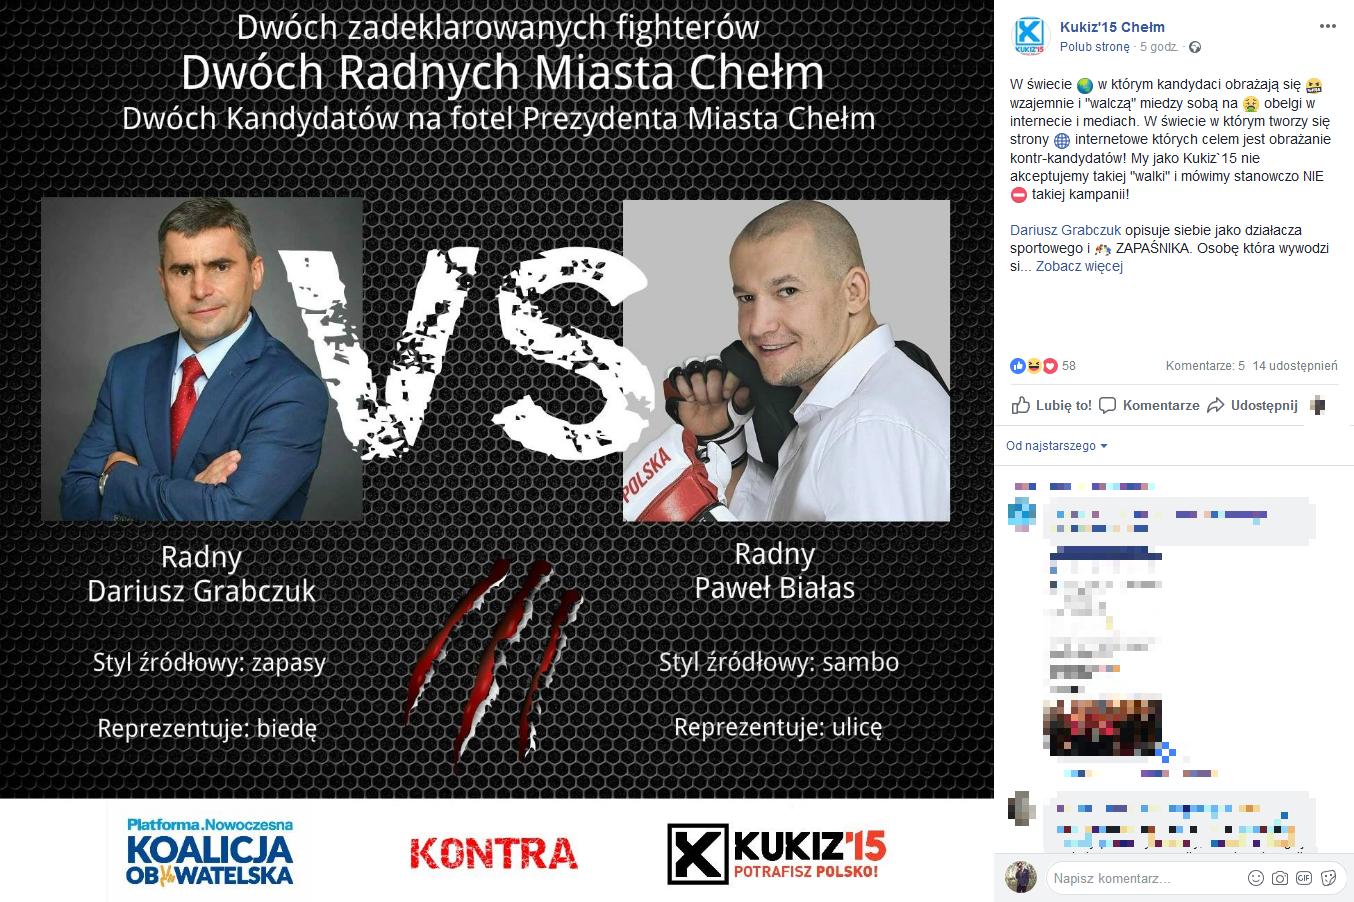 Screenshot_2018-09-17 (1) Kukiz'15 Chełm - Posty2.png